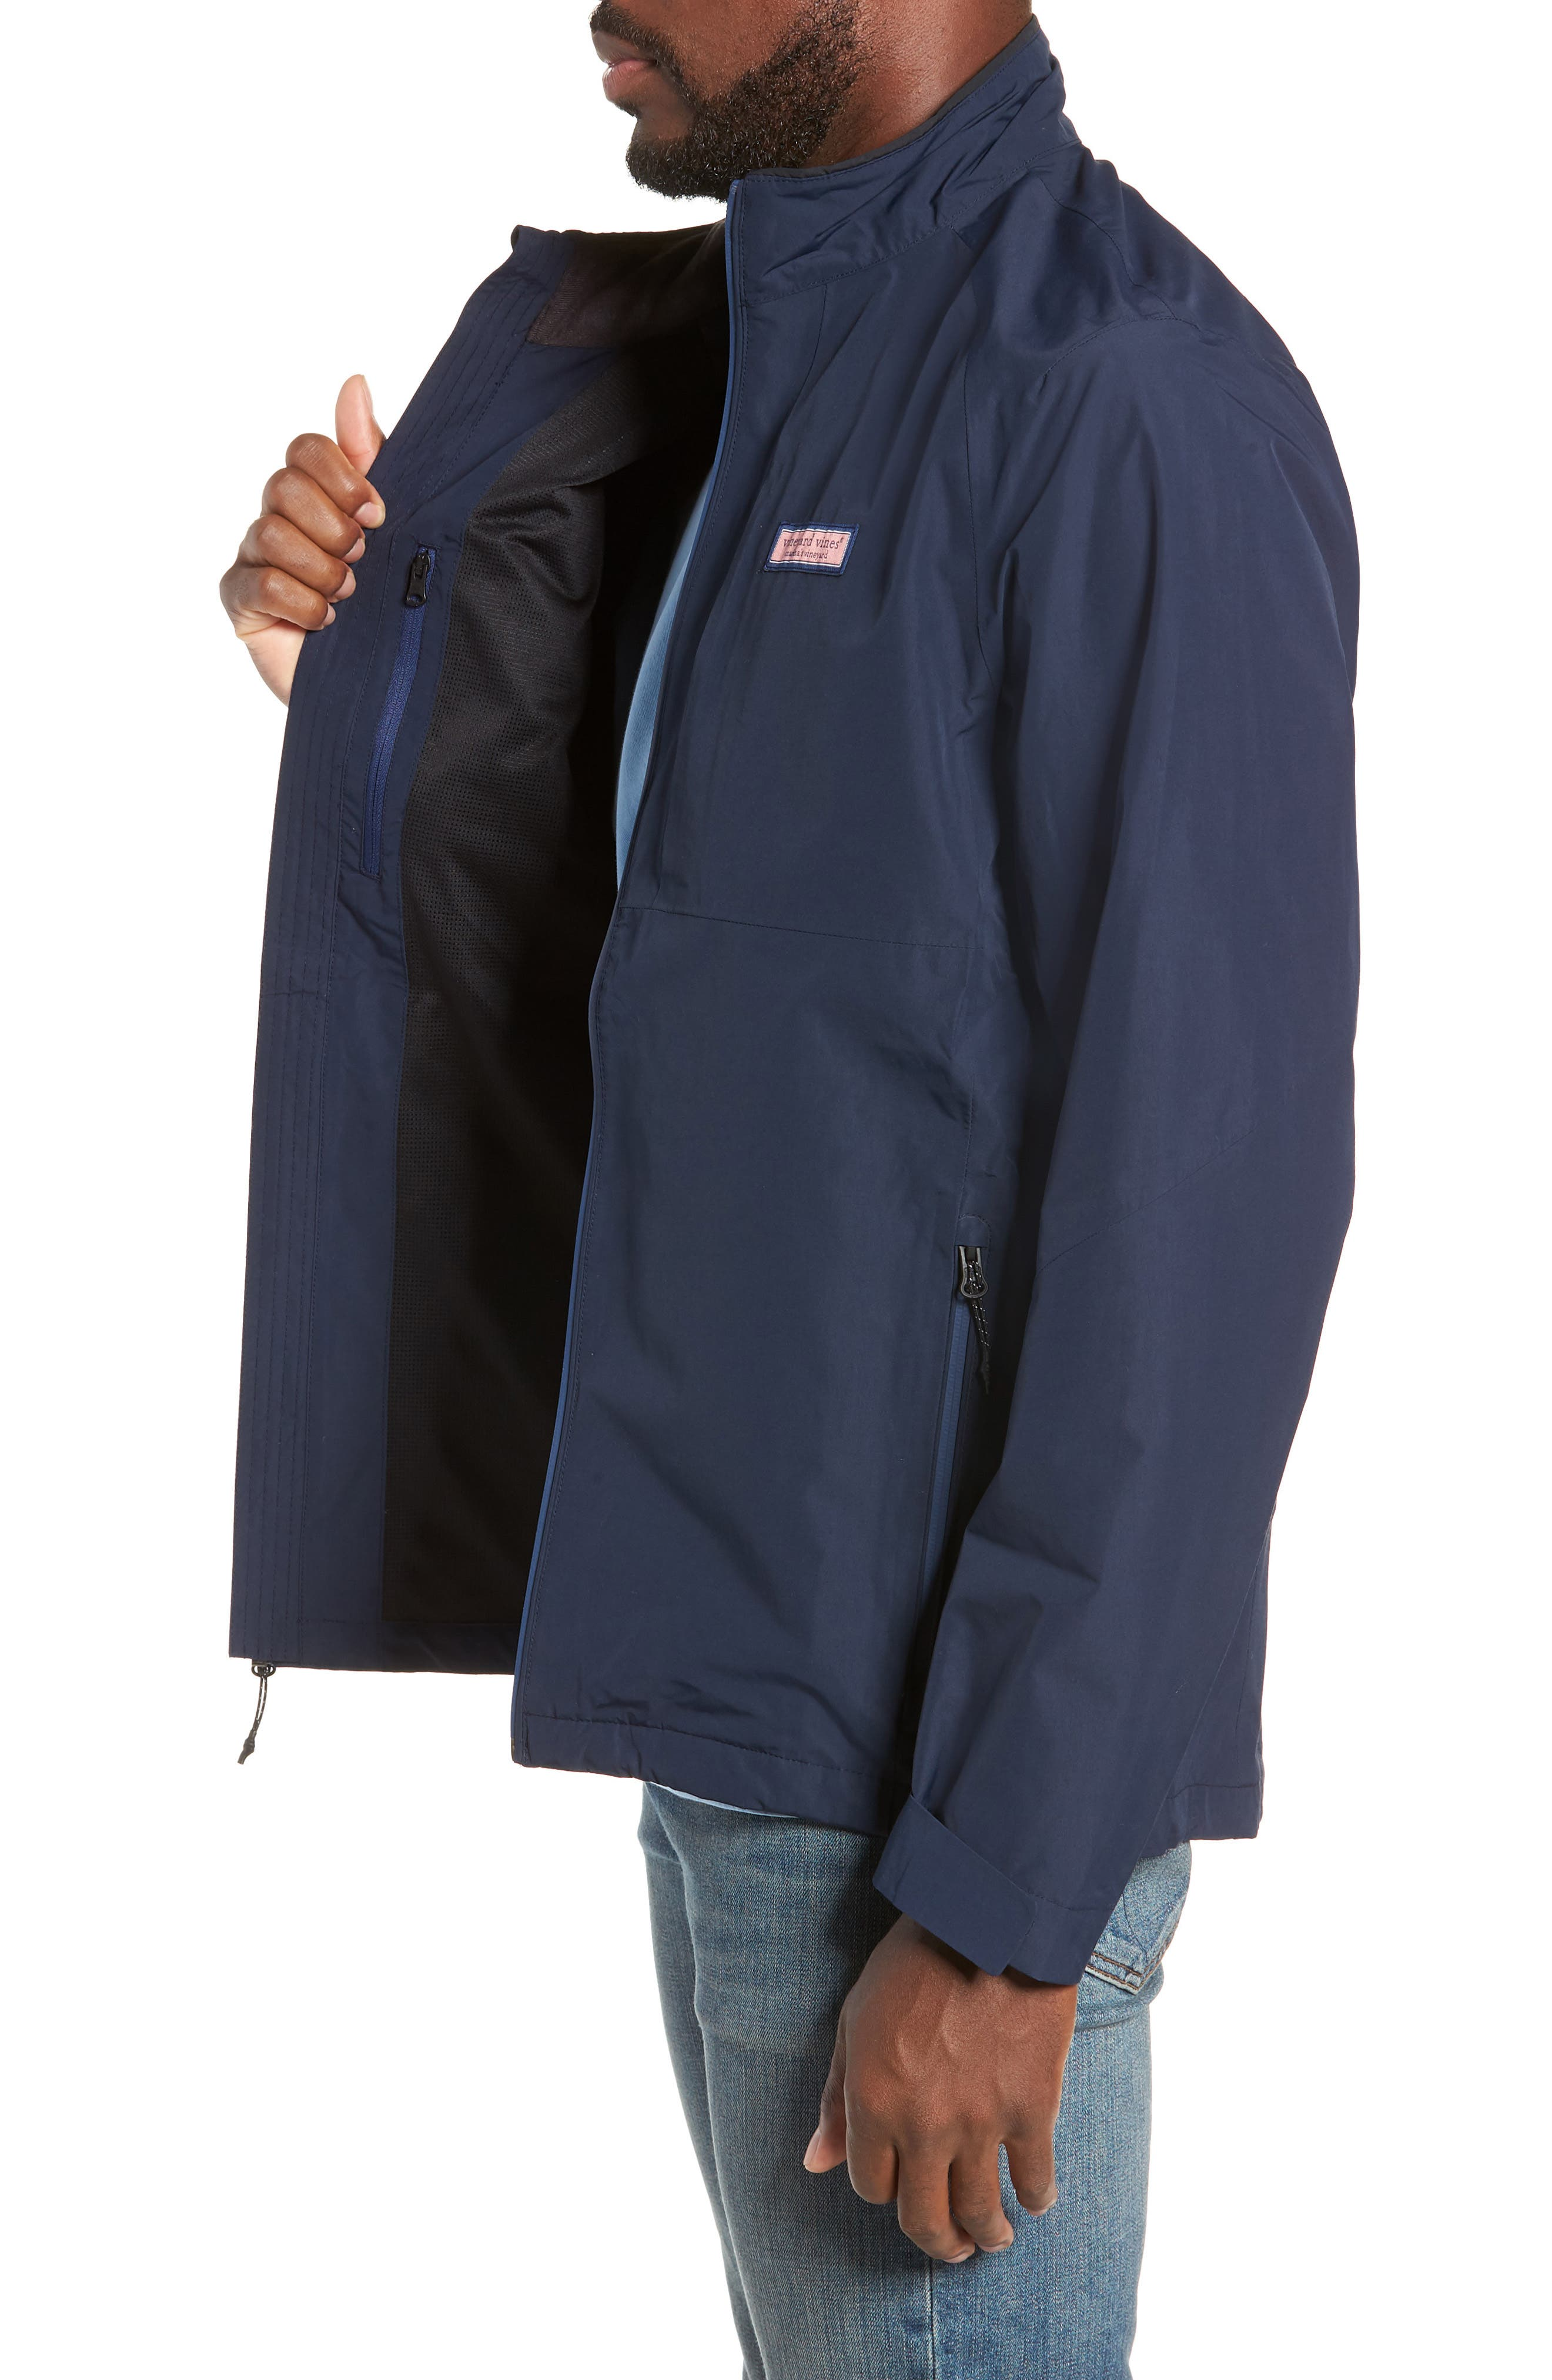 Regatta Performance Jacket,                             Alternate thumbnail 3, color,                             410